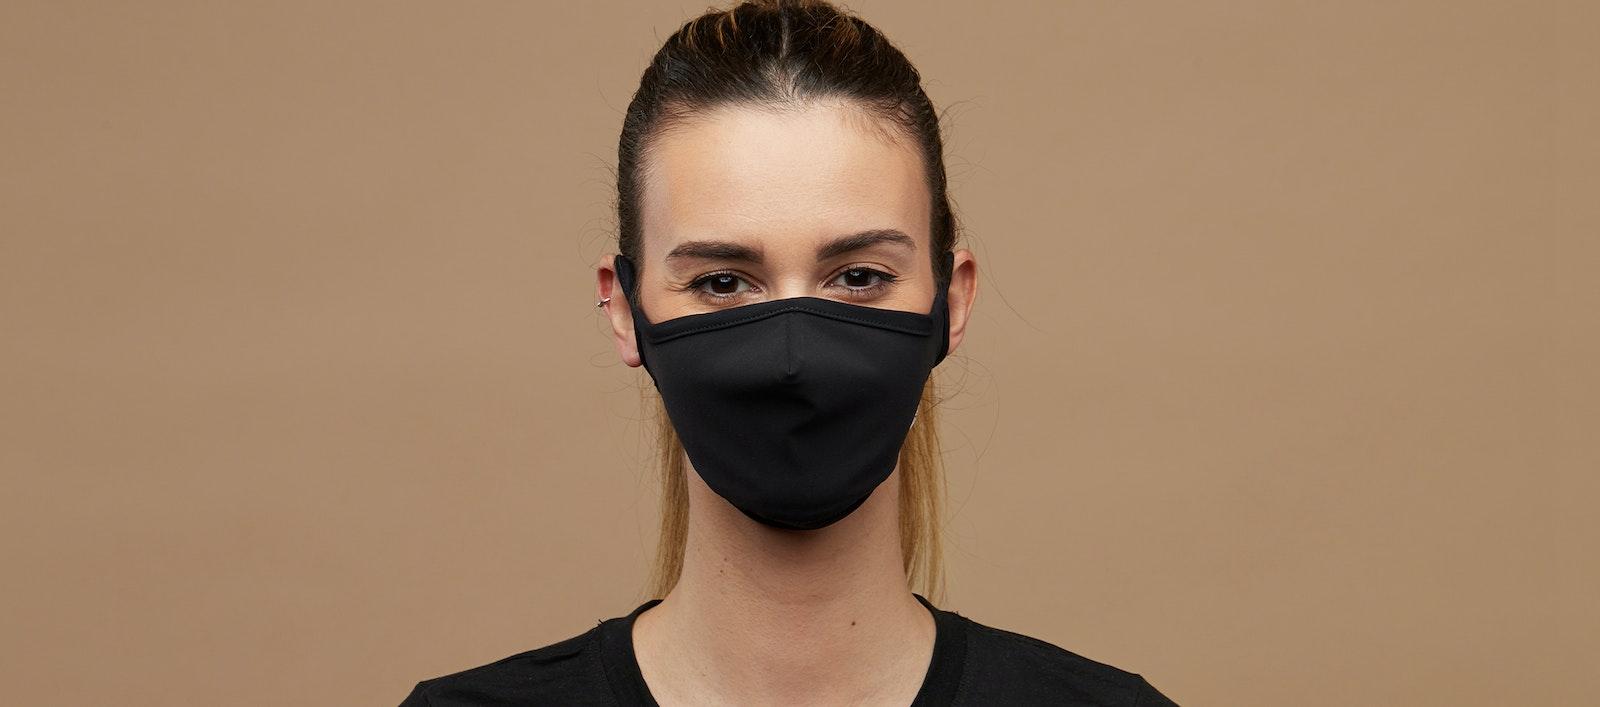 Affordable Fashion Glasses Accessory Men Women BonLook Mask Black Front